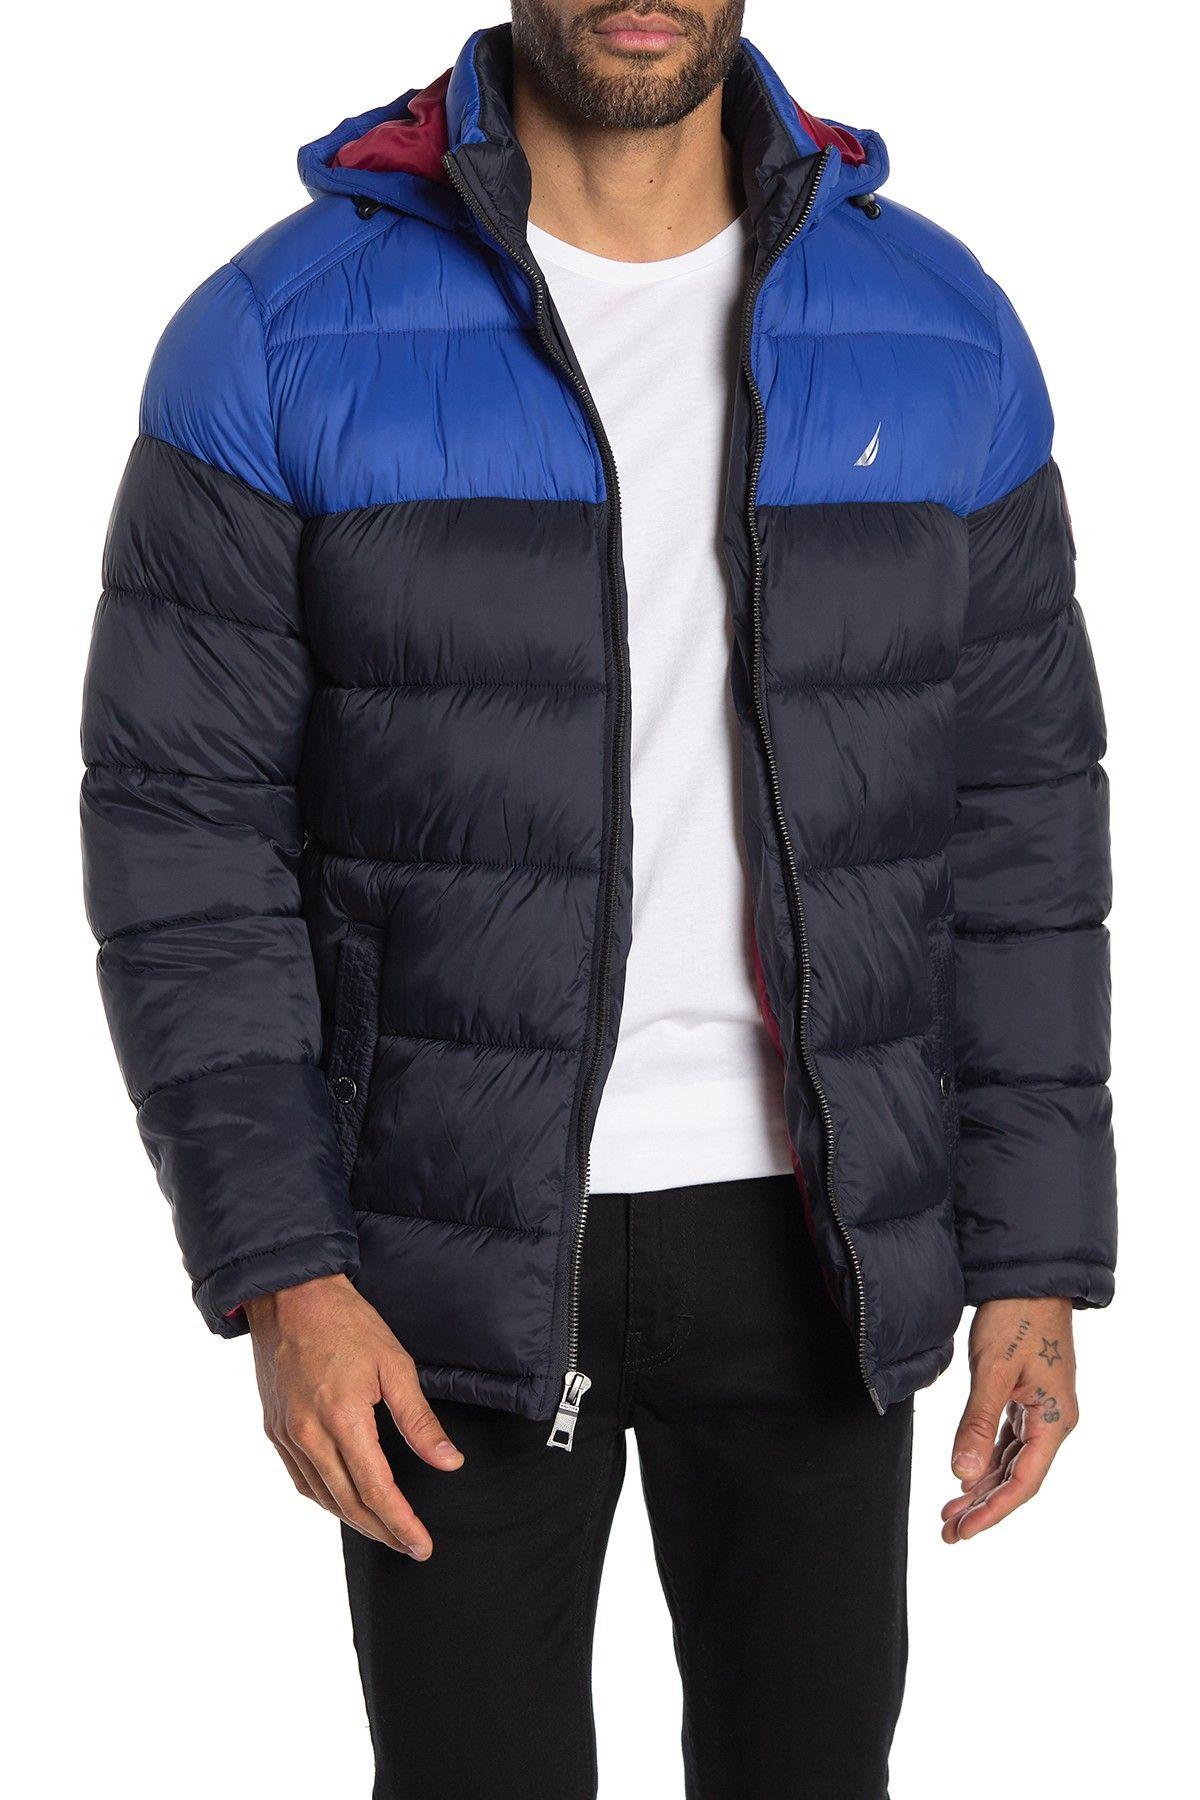 Nautica Water Resistant Hooded Puffer Jacket Nordstrom Rack Wind Resistant Jacket Puffer Jackets Jackets [ 1800 x 1200 Pixel ]